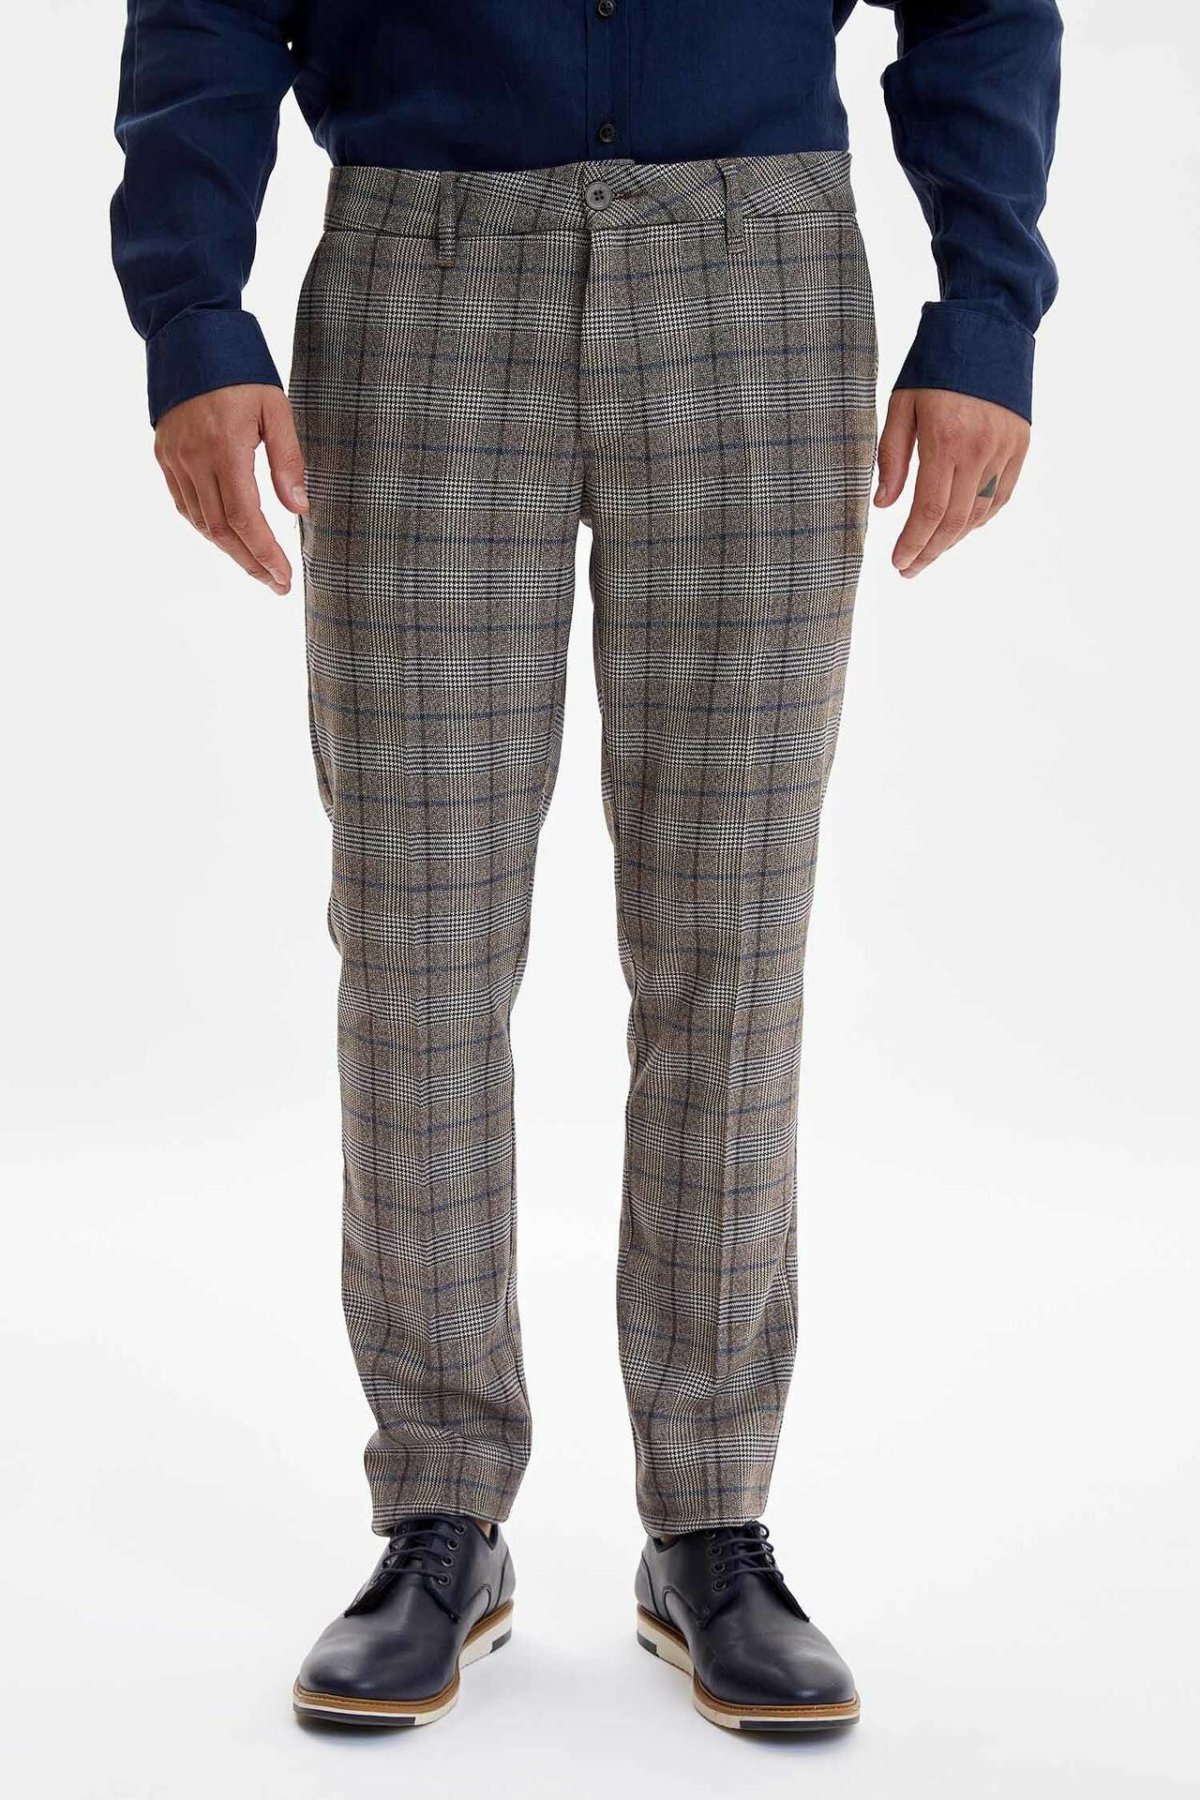 DeFacto Man Fashion Straight Trousers Male Plaid Casual High Quality Leisure Long Pants For Men's Autumn New - L3263AZ19AU